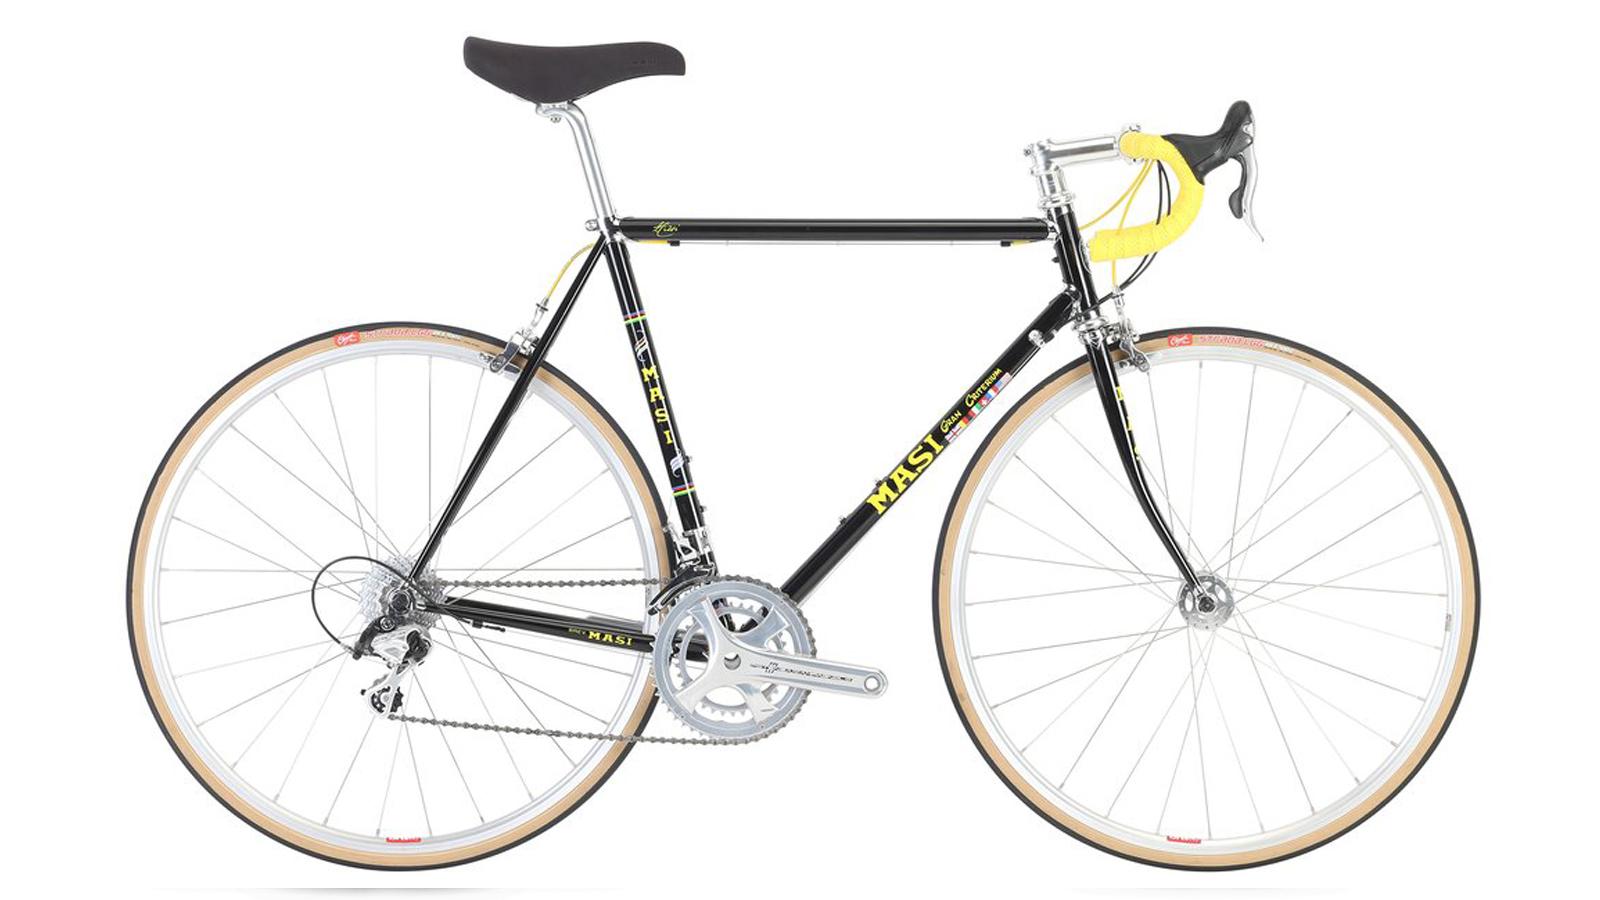 Best steel bikes: Masi